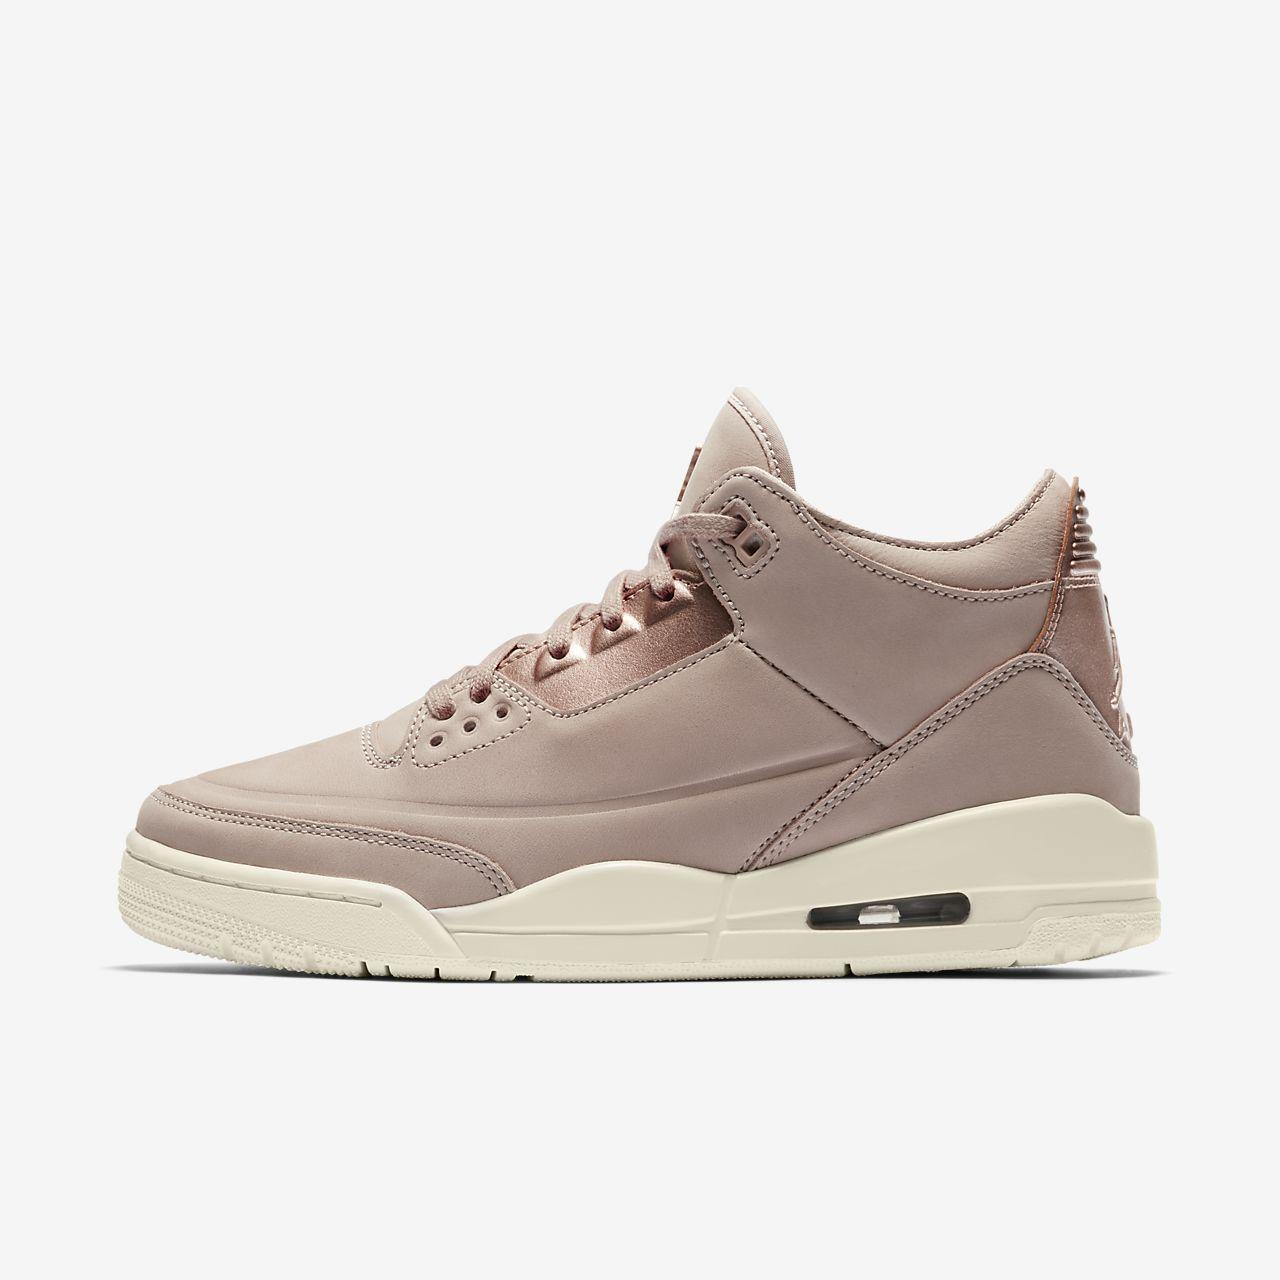 Nike Air Jordan 3 Retro SE Women's Shoe Browse Cheap Price Low Shipping Fee Cheap Price Clearance Browse Discount Genuine Cheap 100% Original HXp086sP